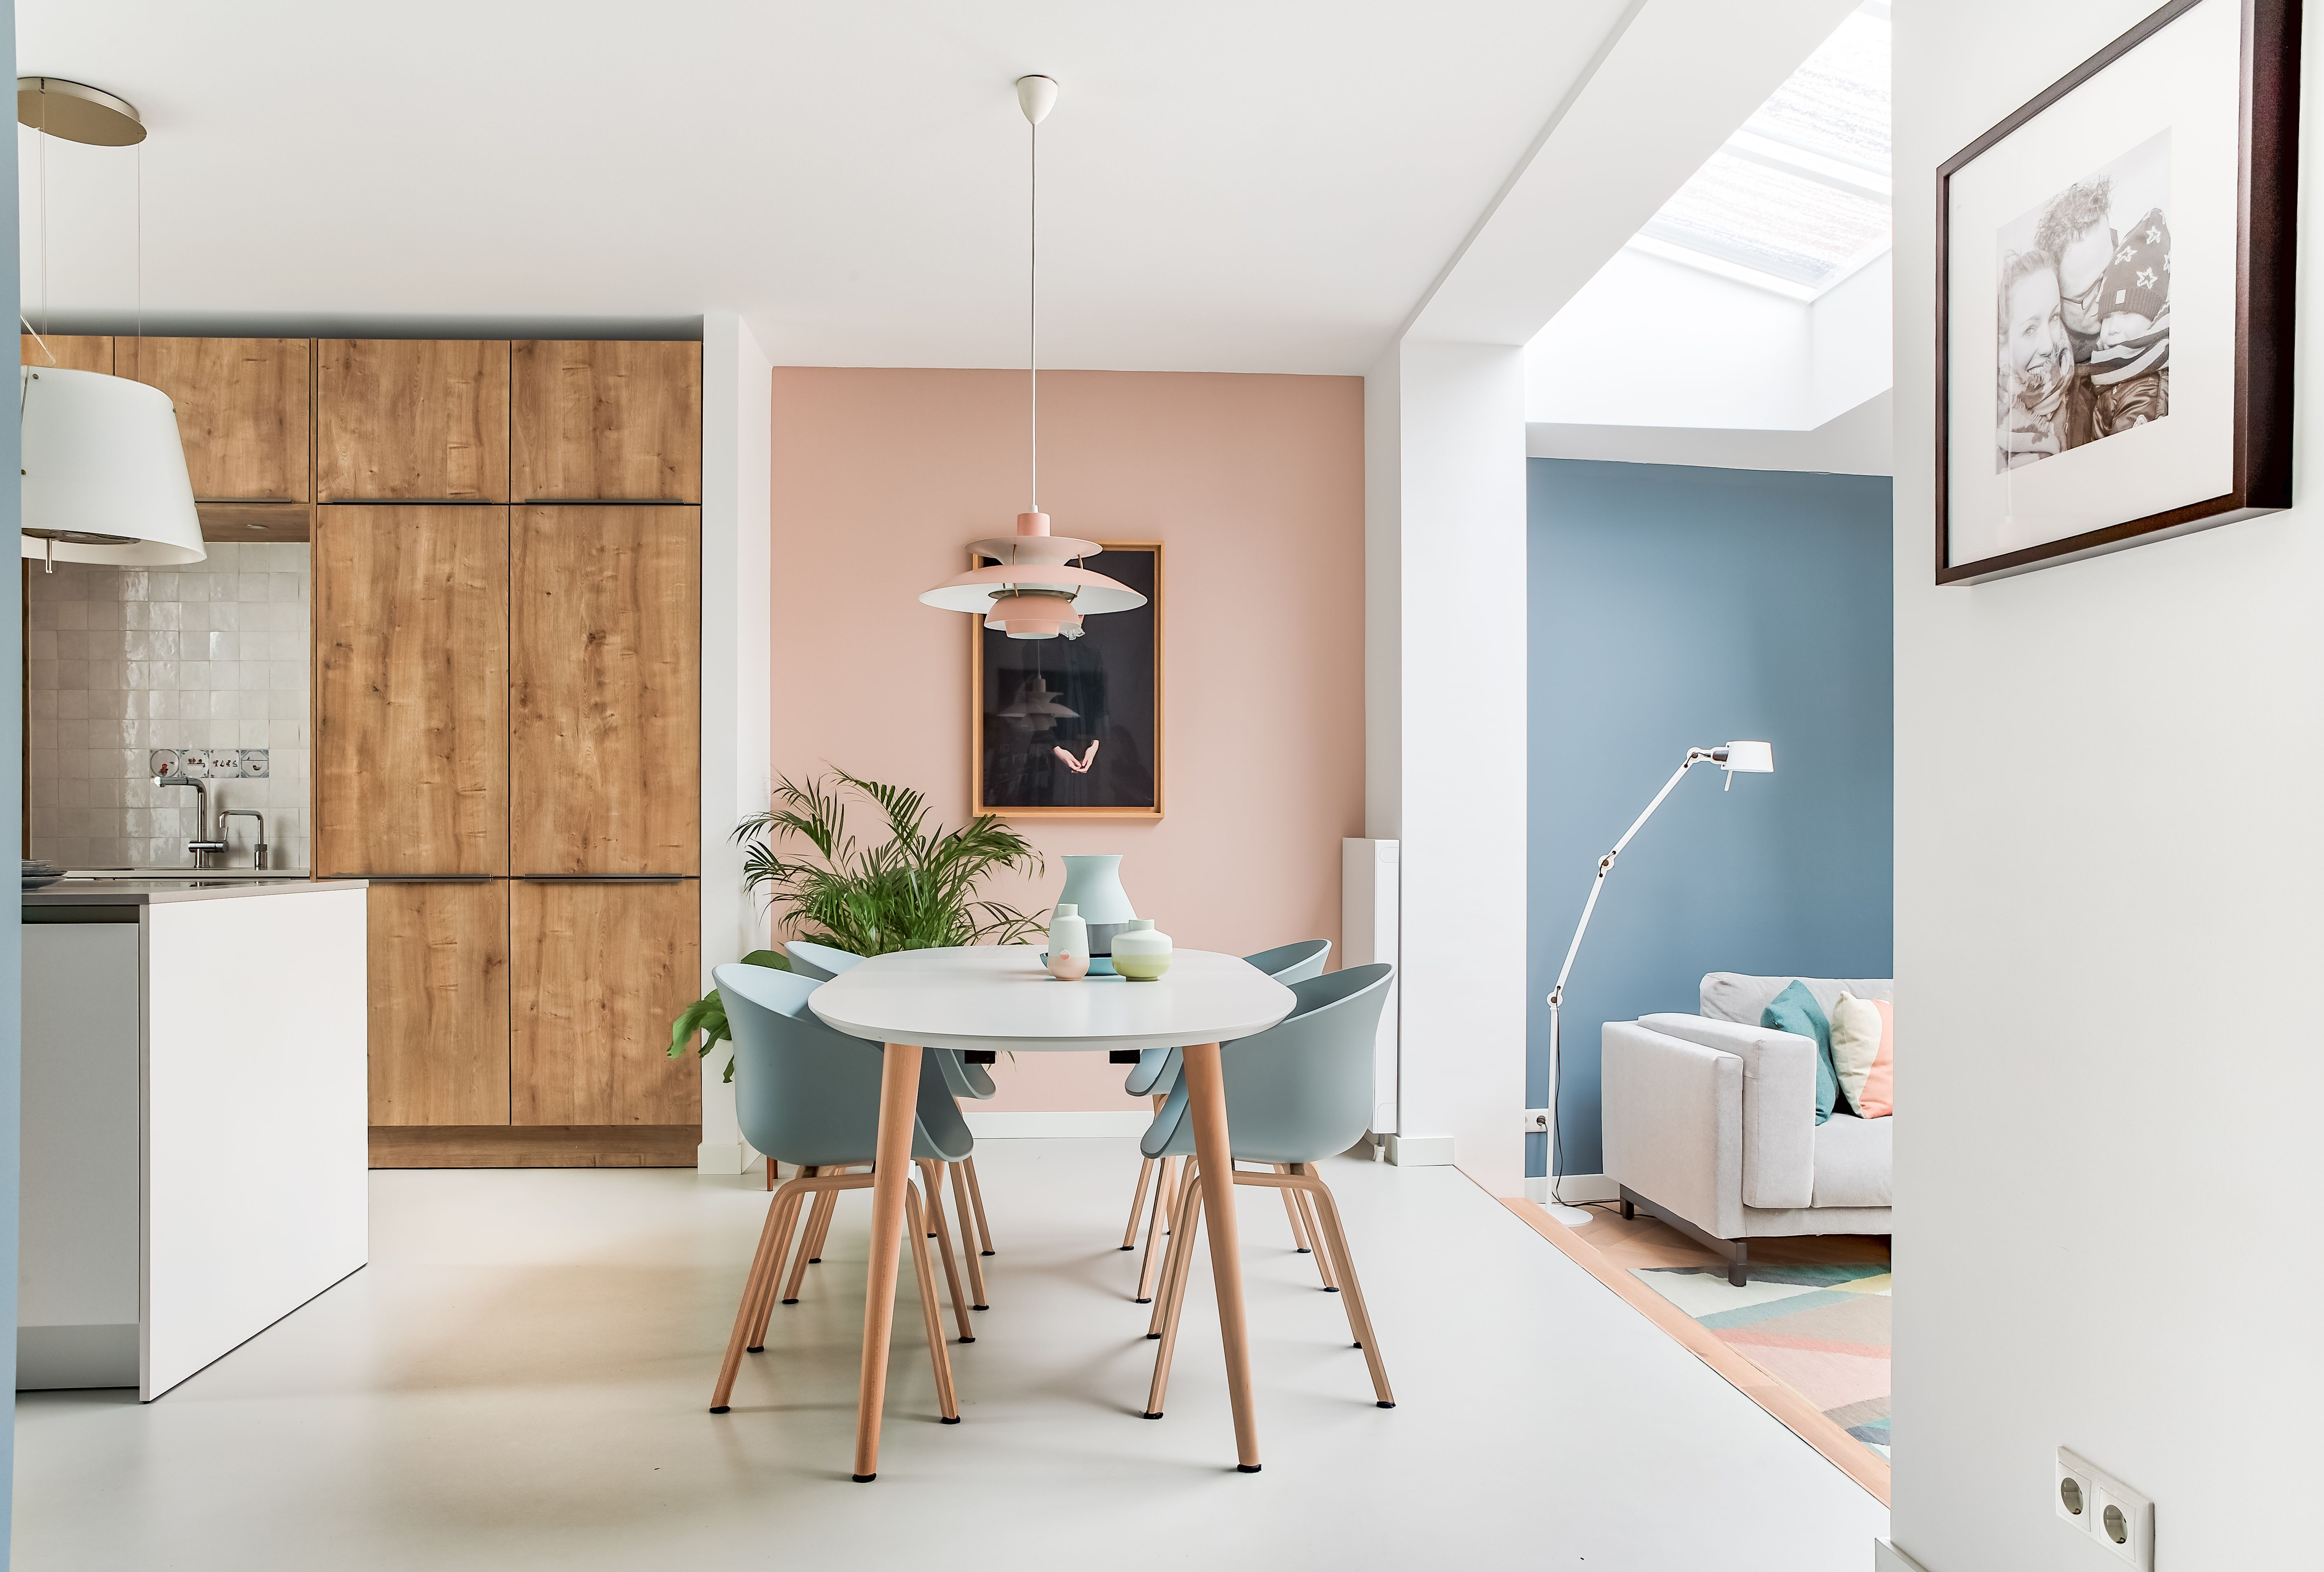 Design Keuken Utrecht : Studio binnen interior design project utrecht blue pink